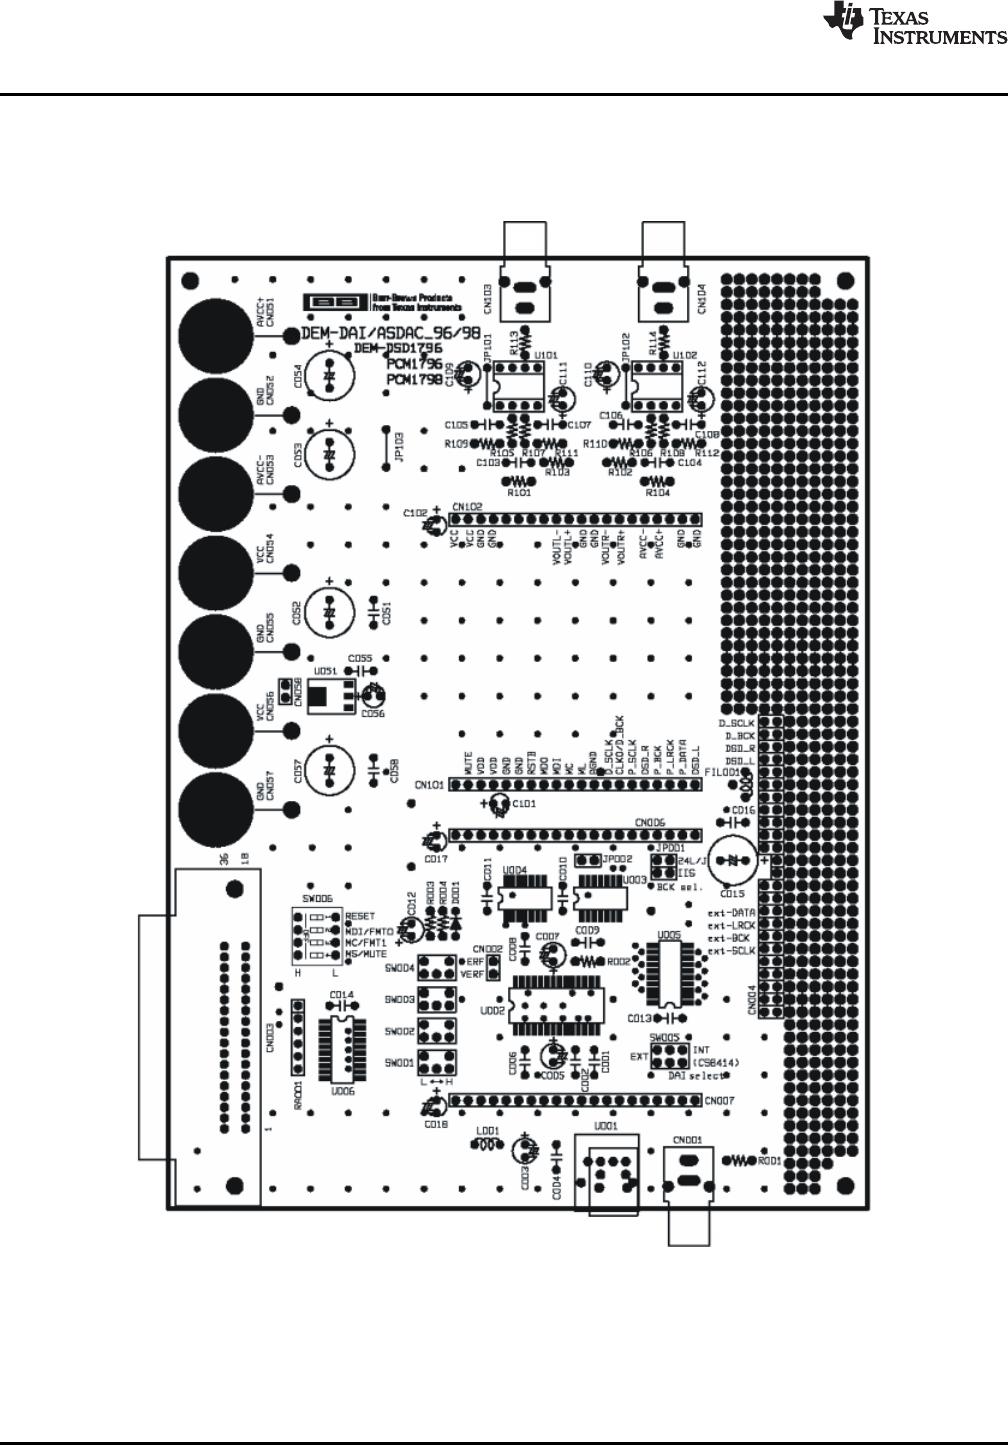 Texas Instruments Dem Dsd1796 Pcm1795 Pcm1796 Pcm1798 Page 12 Printed Circuit Board Designer 21 Dai Asdac Layout